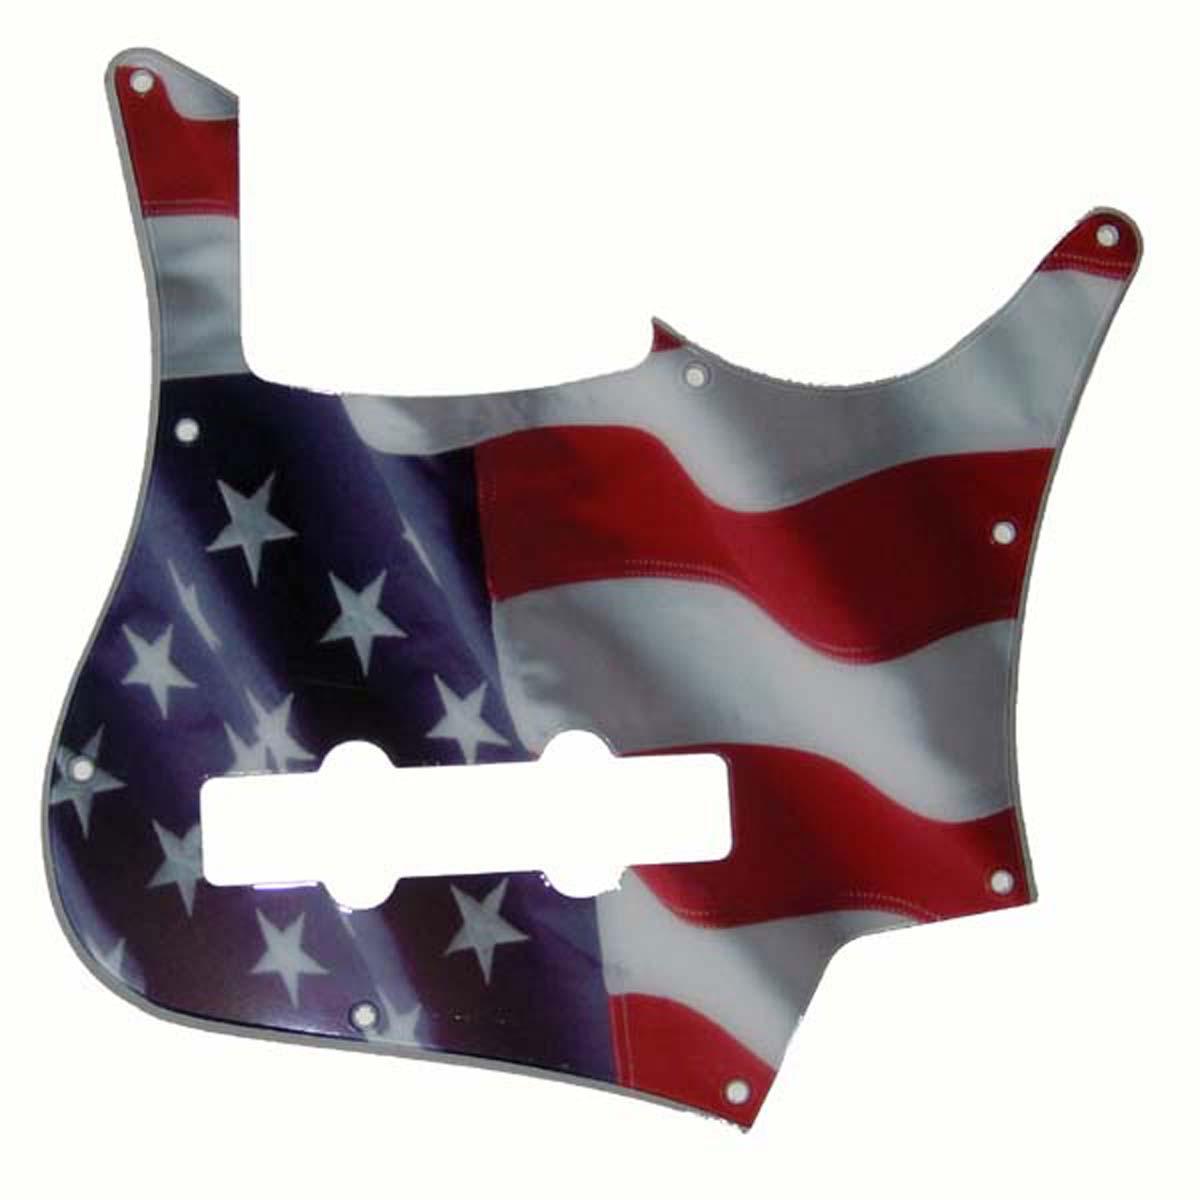 Carvin ® SB5000 5 String Bass Pickguard- 2-ply - USA American Flag-  004